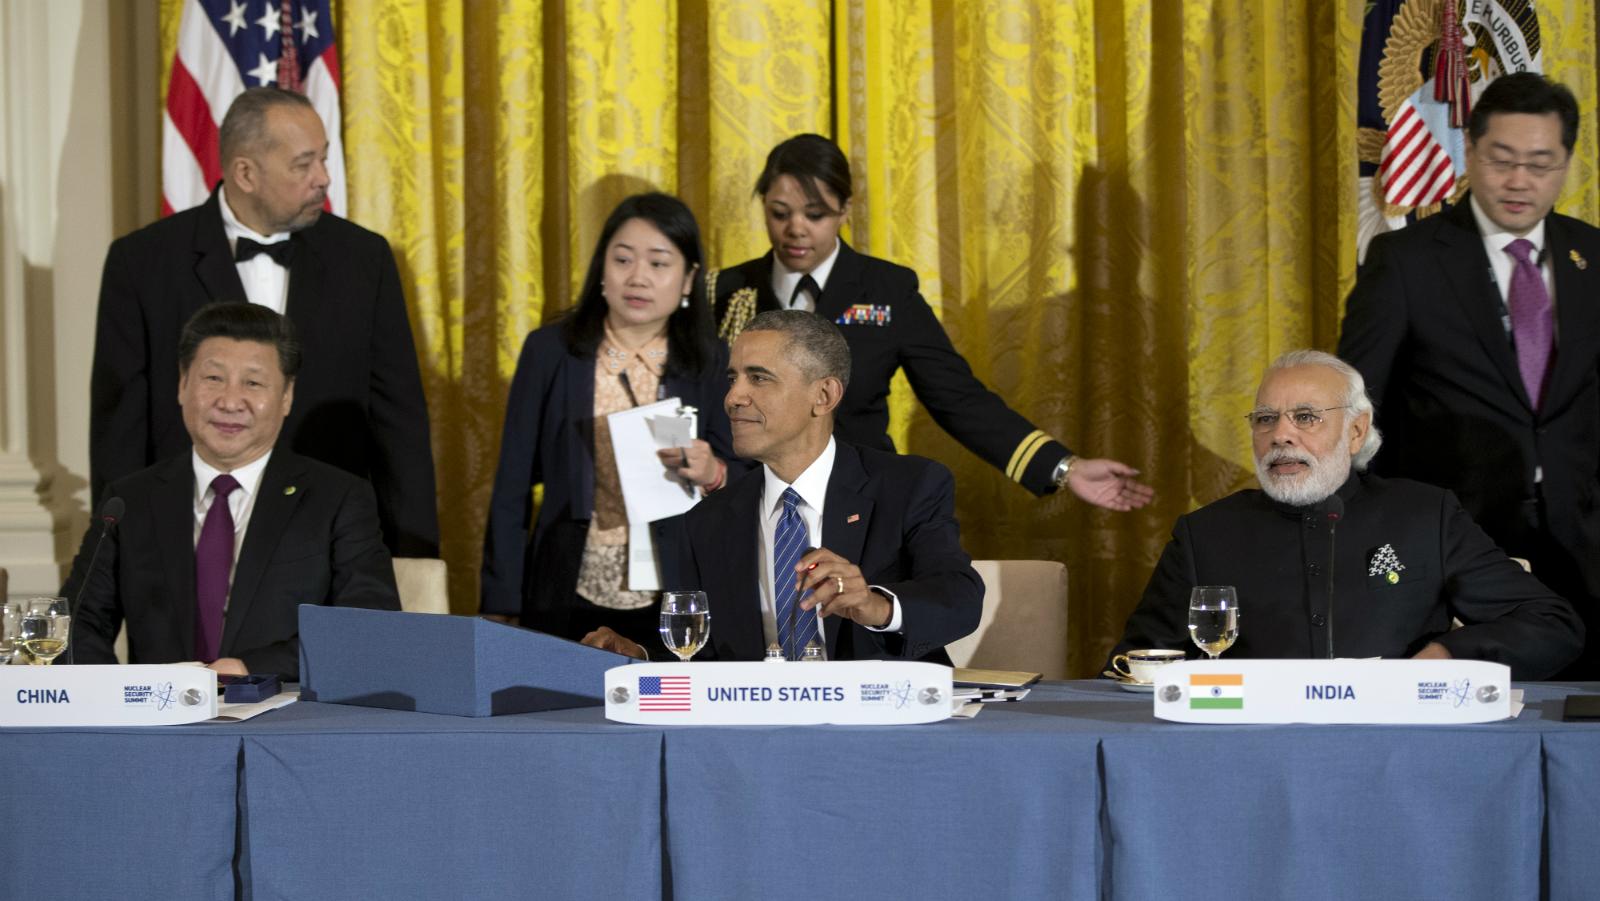 Modi-Obama-Xi-Jinping-NSG-Nuclear Suppliers Group